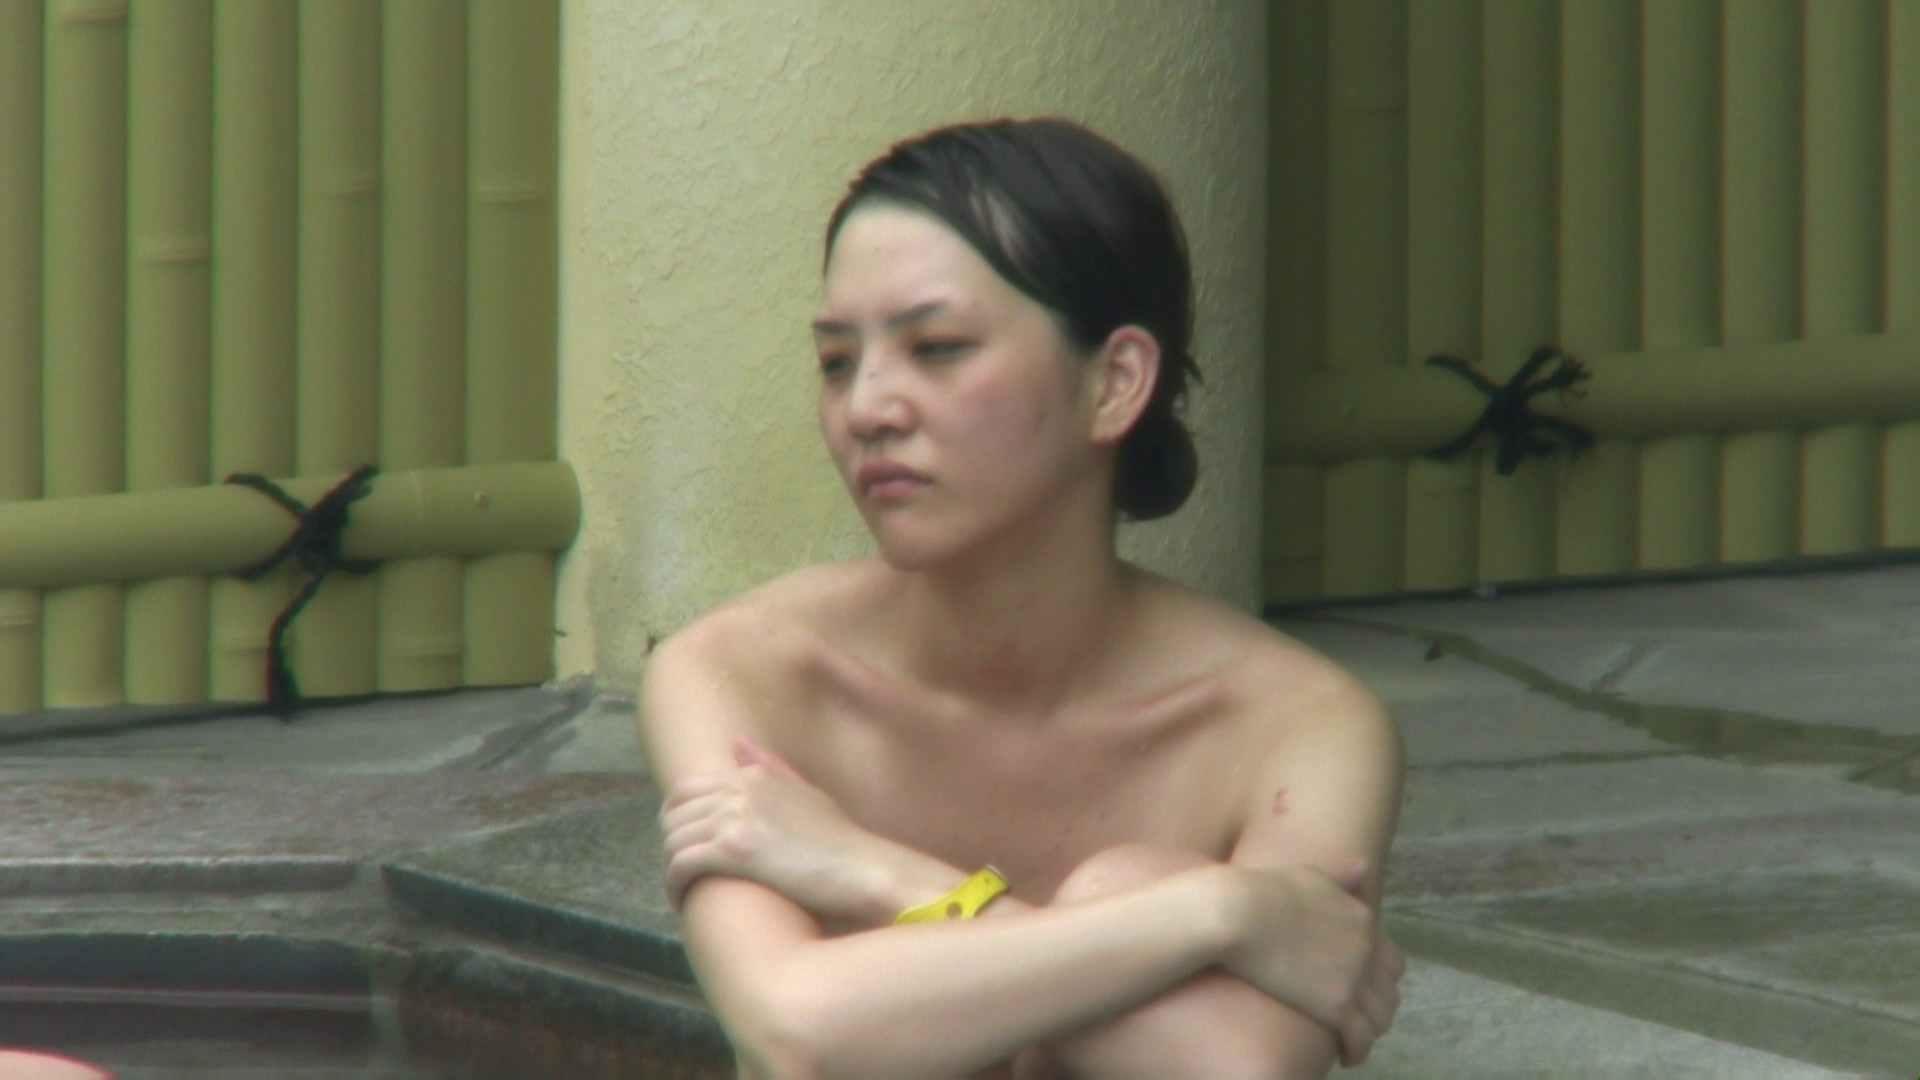 Aquaな露天風呂Vol.64【VIP限定】 露天風呂編 | 盗撮シリーズ  78PIX 27